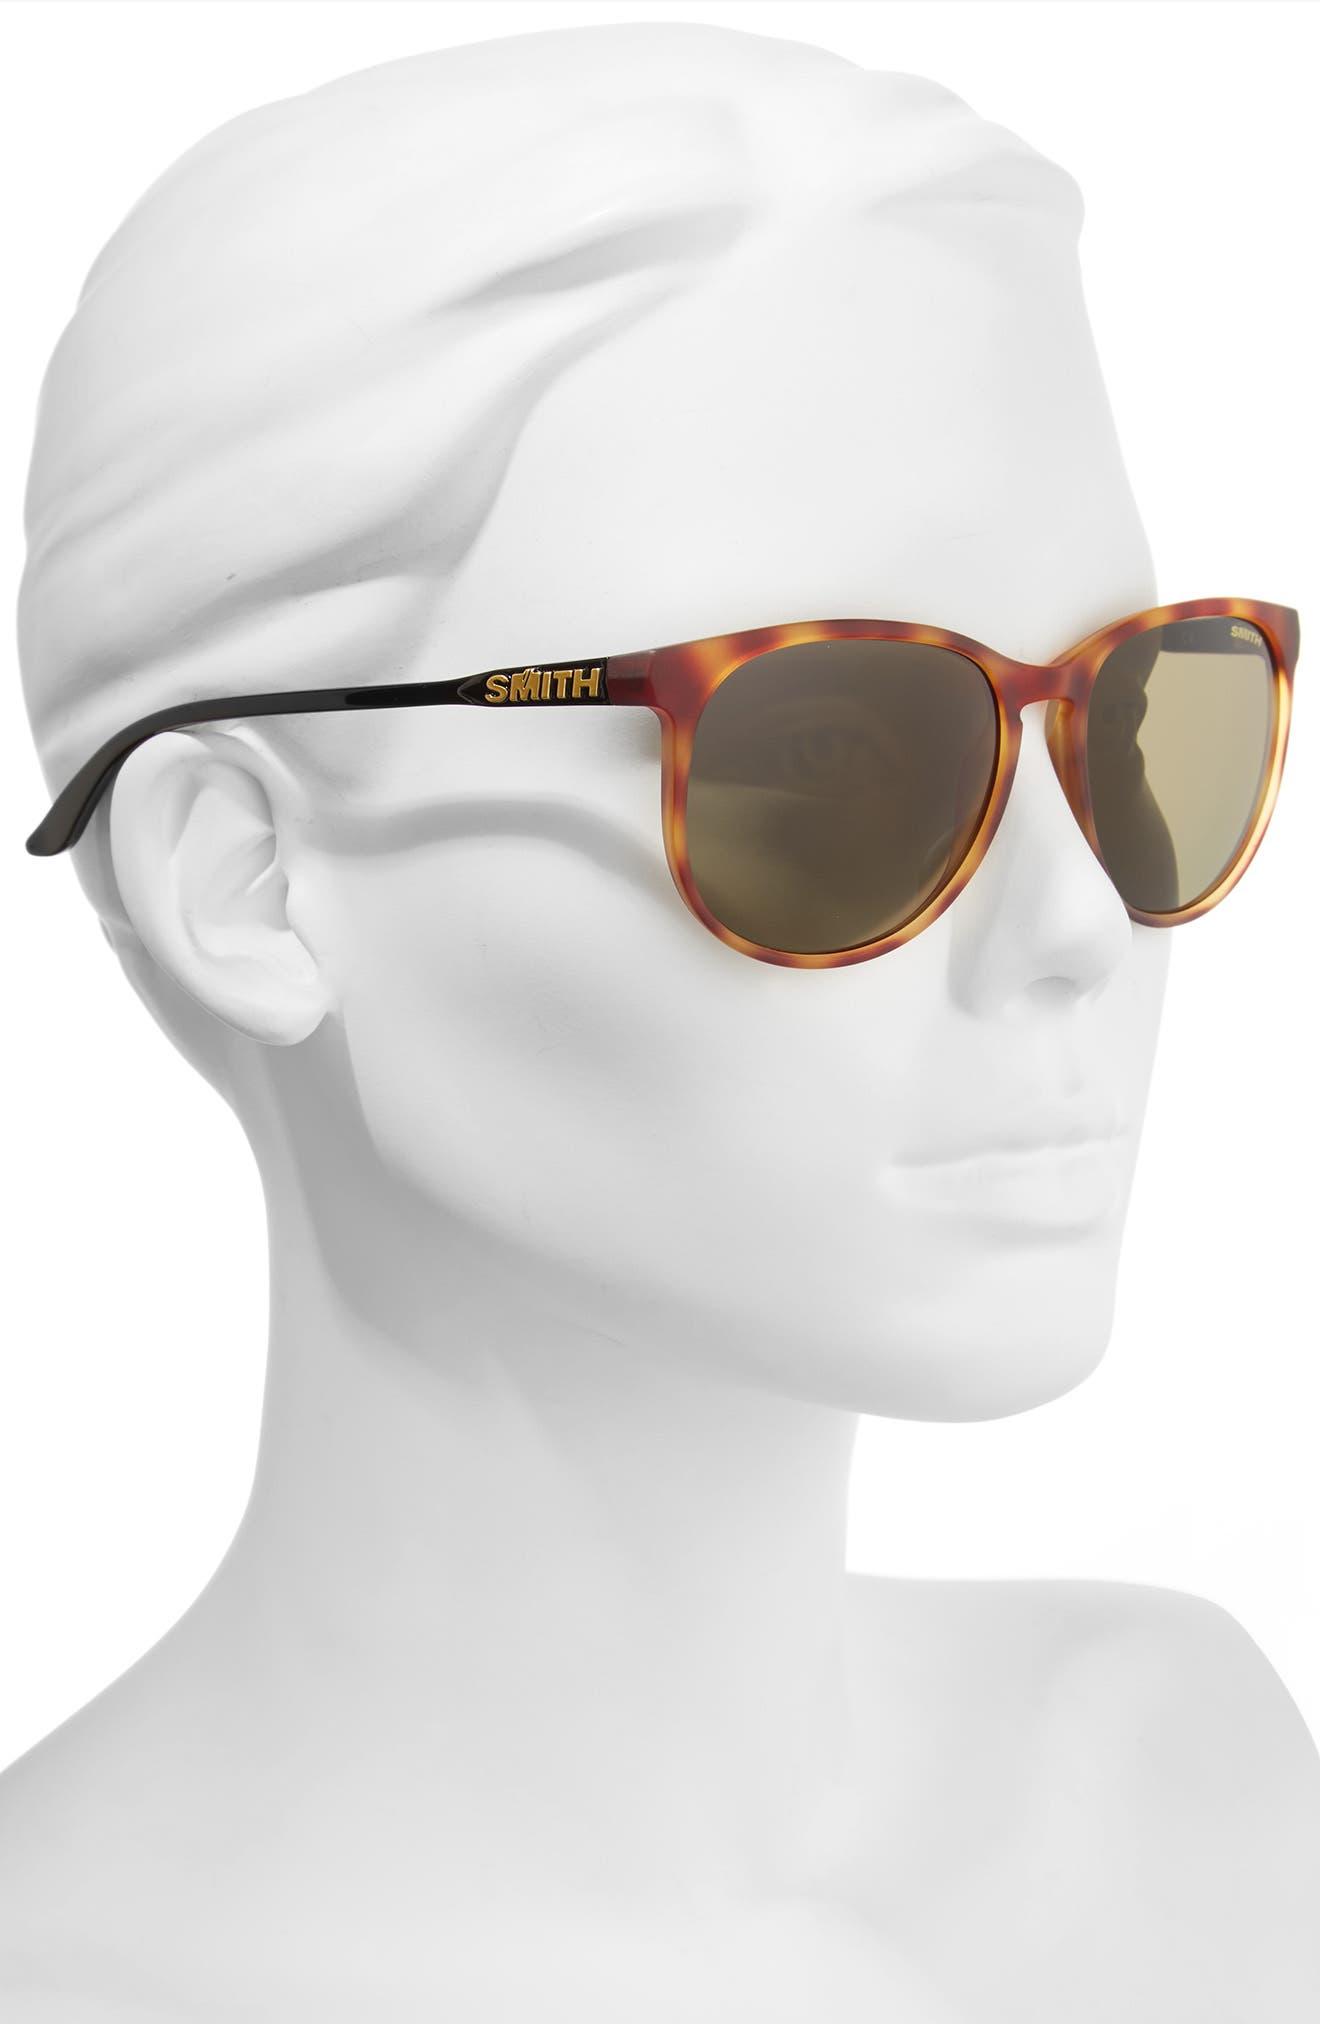 Mt. Shasta 55mm Polarized Keyhole Sunglasses,                             Alternate thumbnail 2, color,                             200